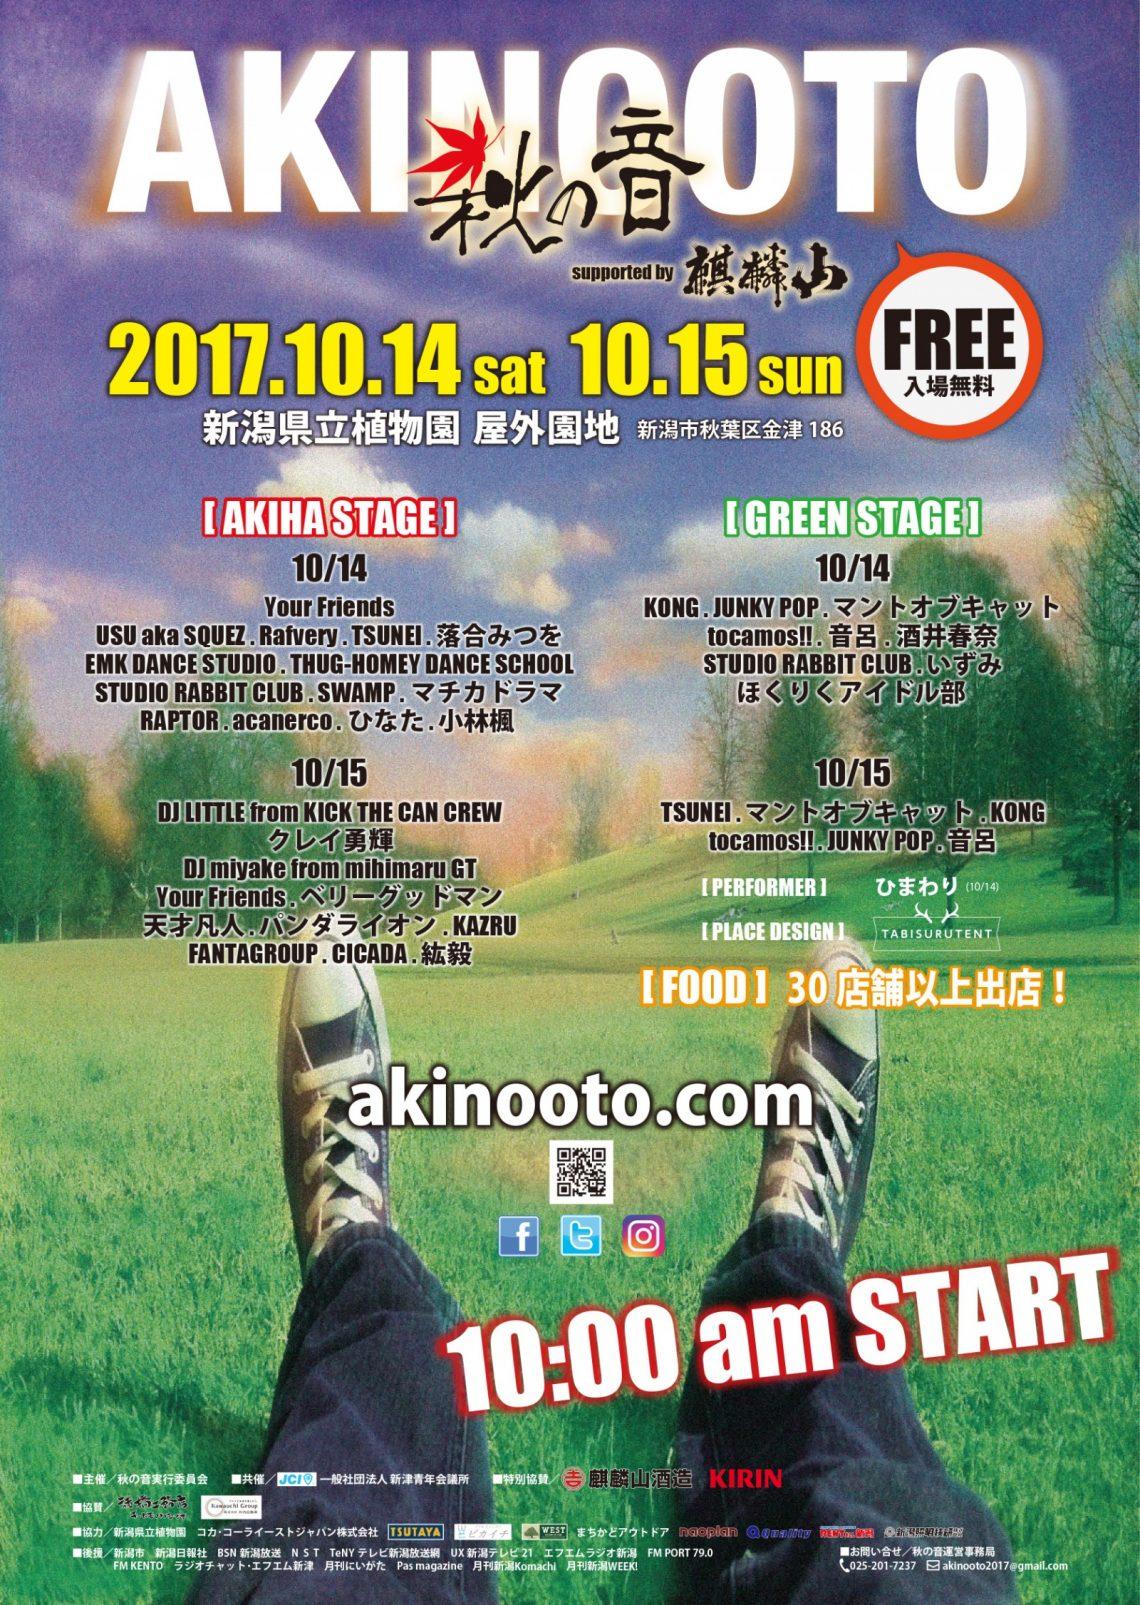 2017.10.14 SAT – TAWARA : LIVE with SWAMP @ 新潟県立植物園 / AKINOOTO 2017